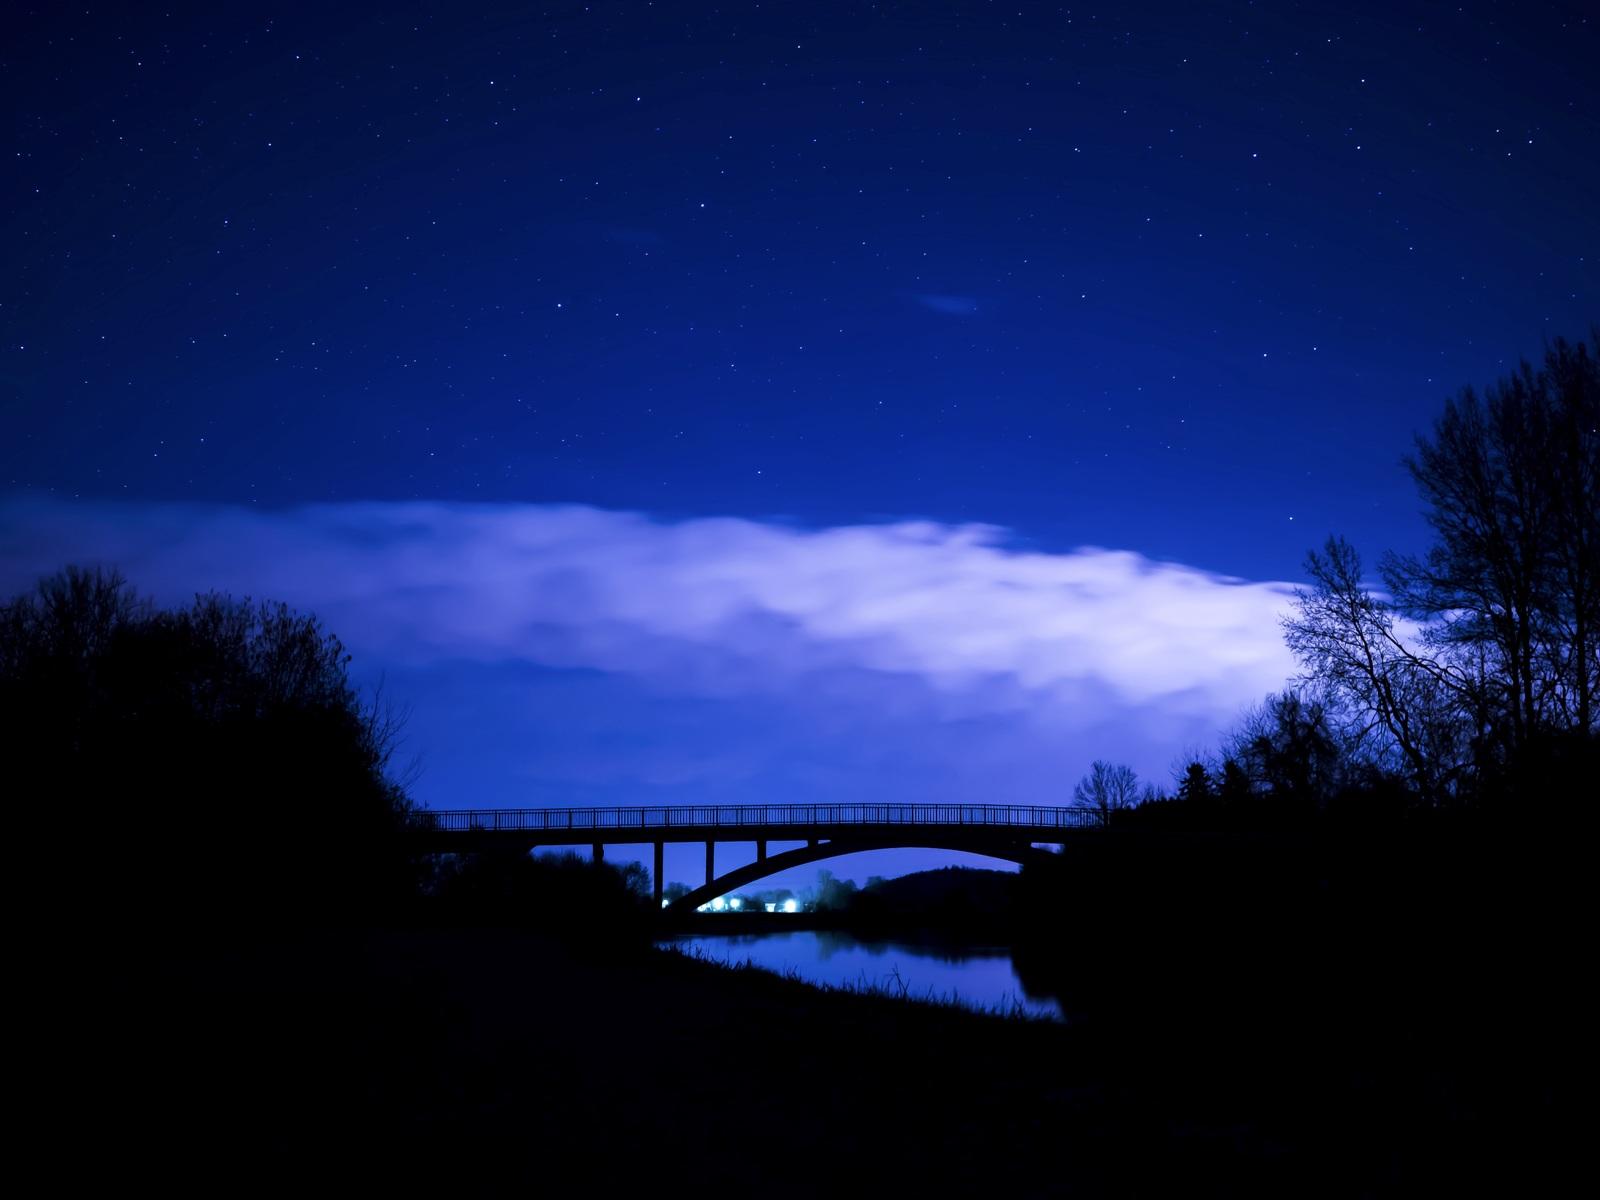 bridge-night-clouds-starry-sky-5k-go.jpg